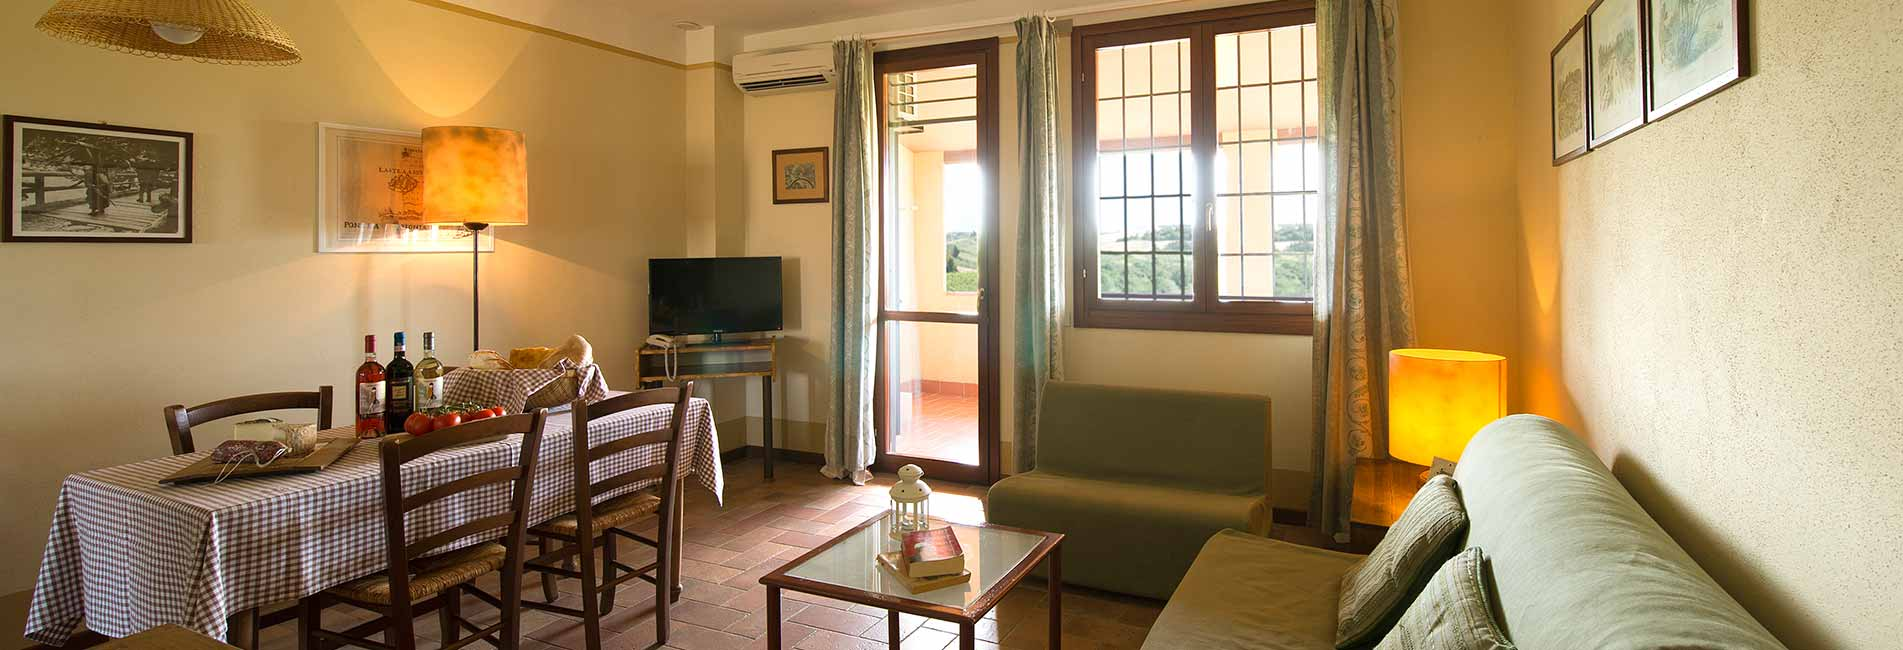 borgo_filicardo_apartments_chianti_tuscany4